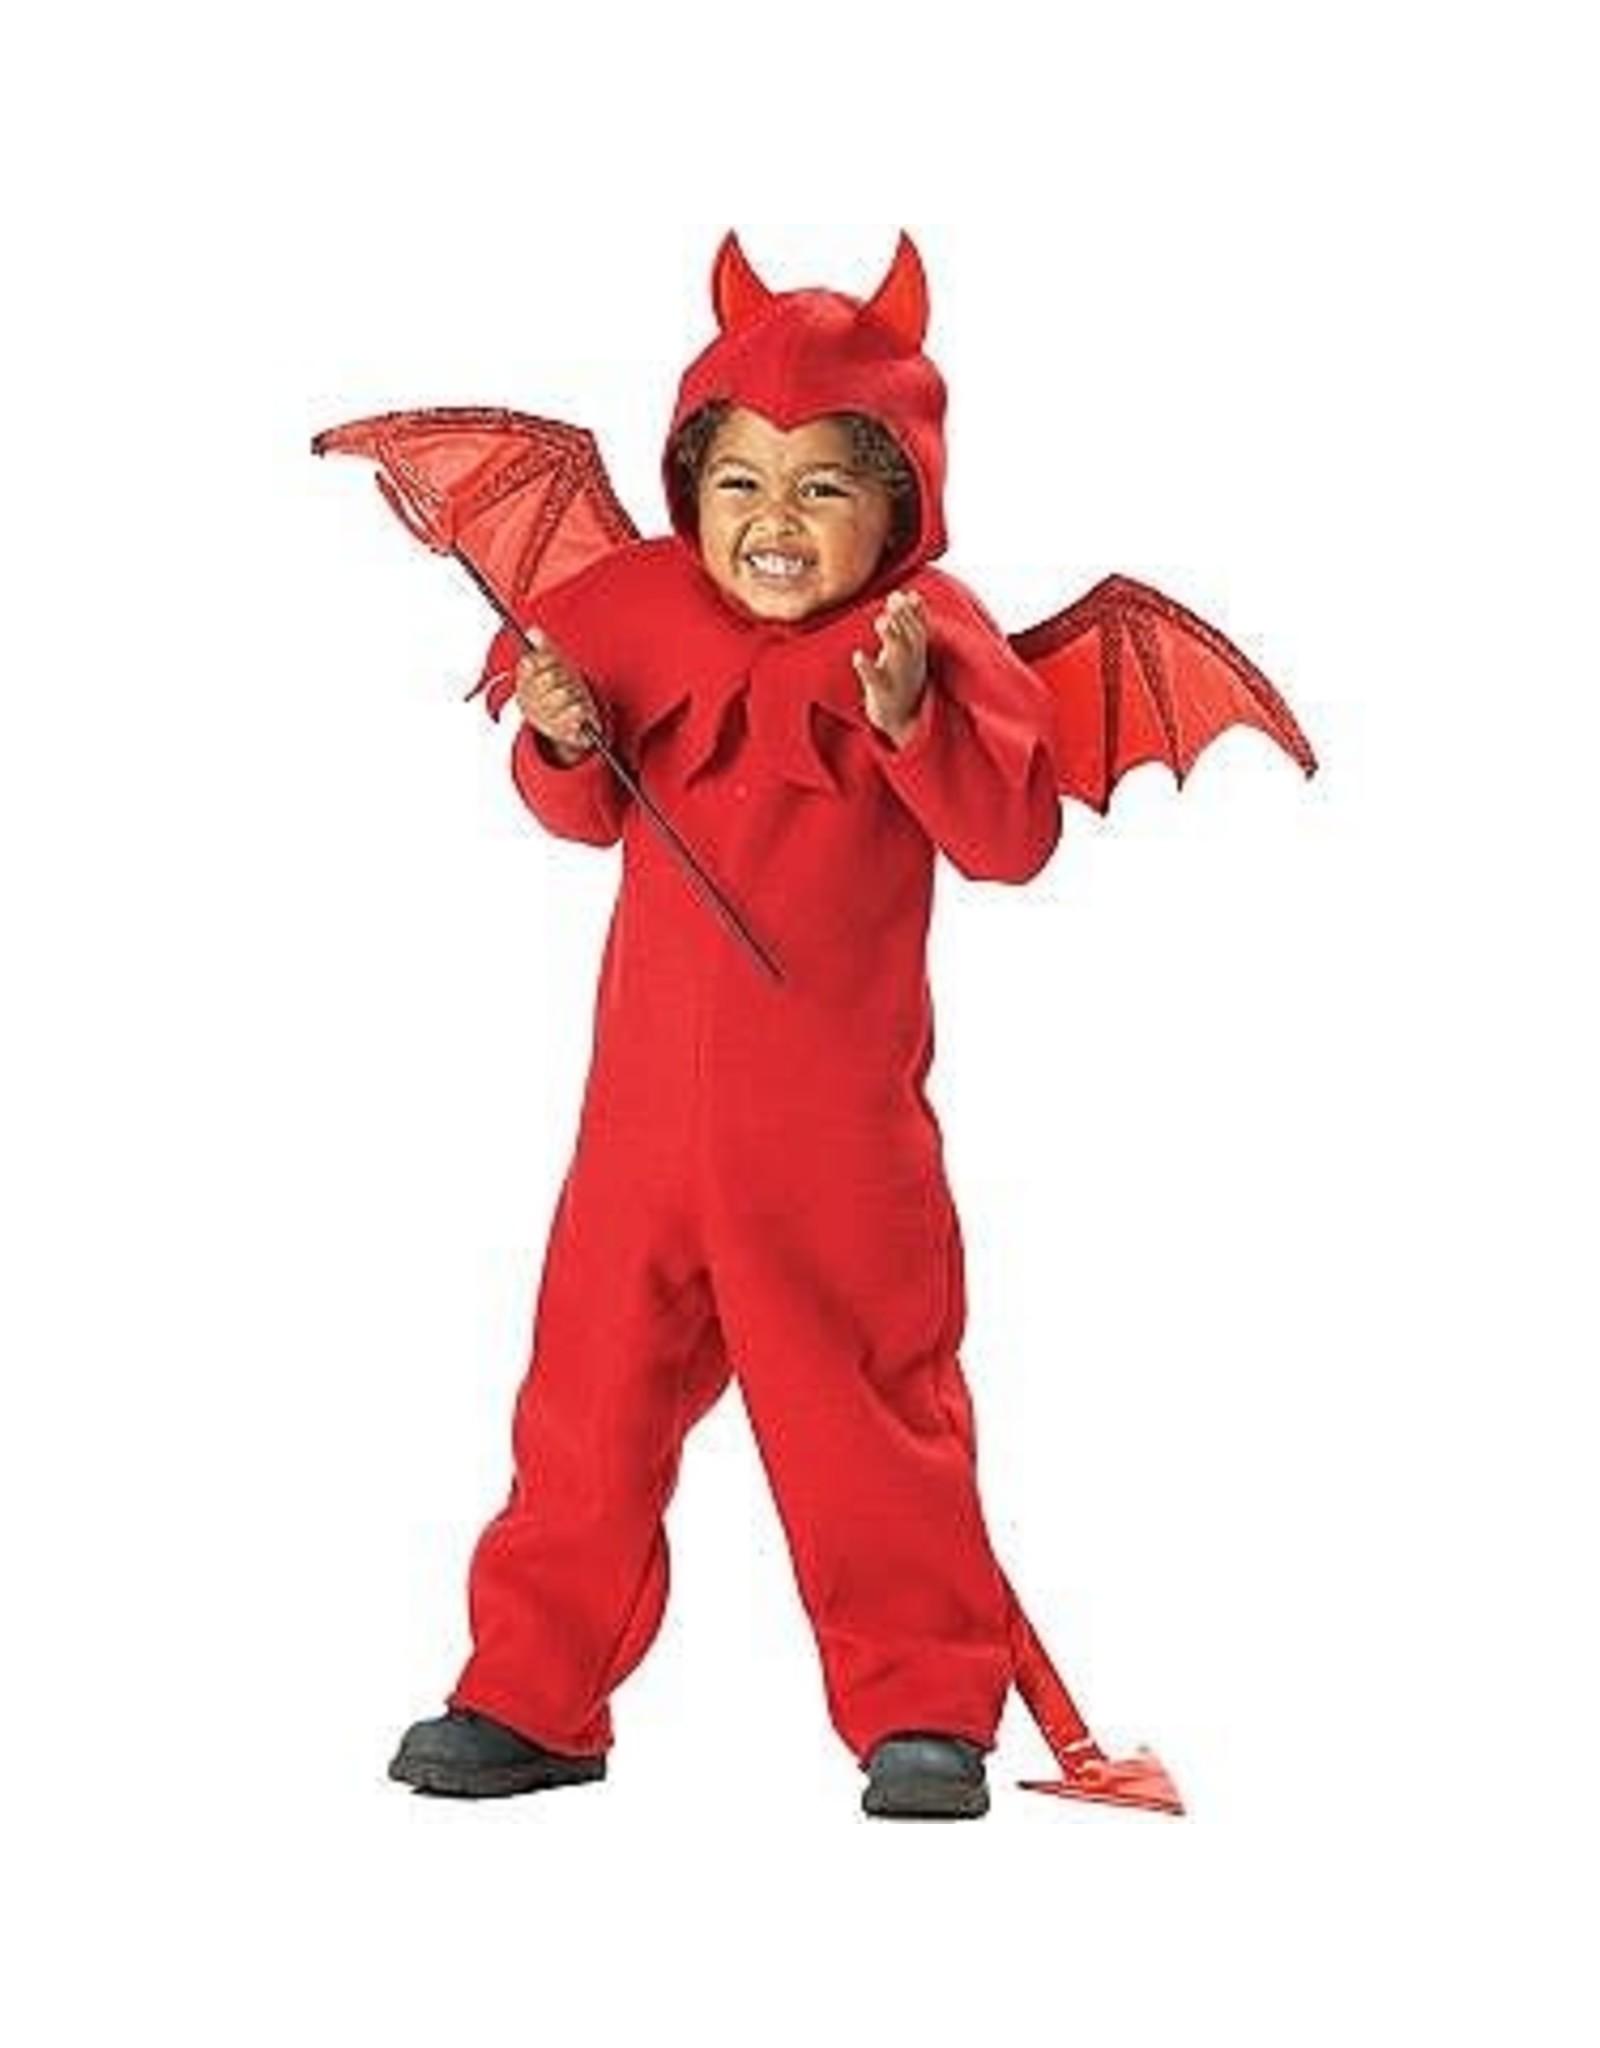 California Costume Lil Spitfire